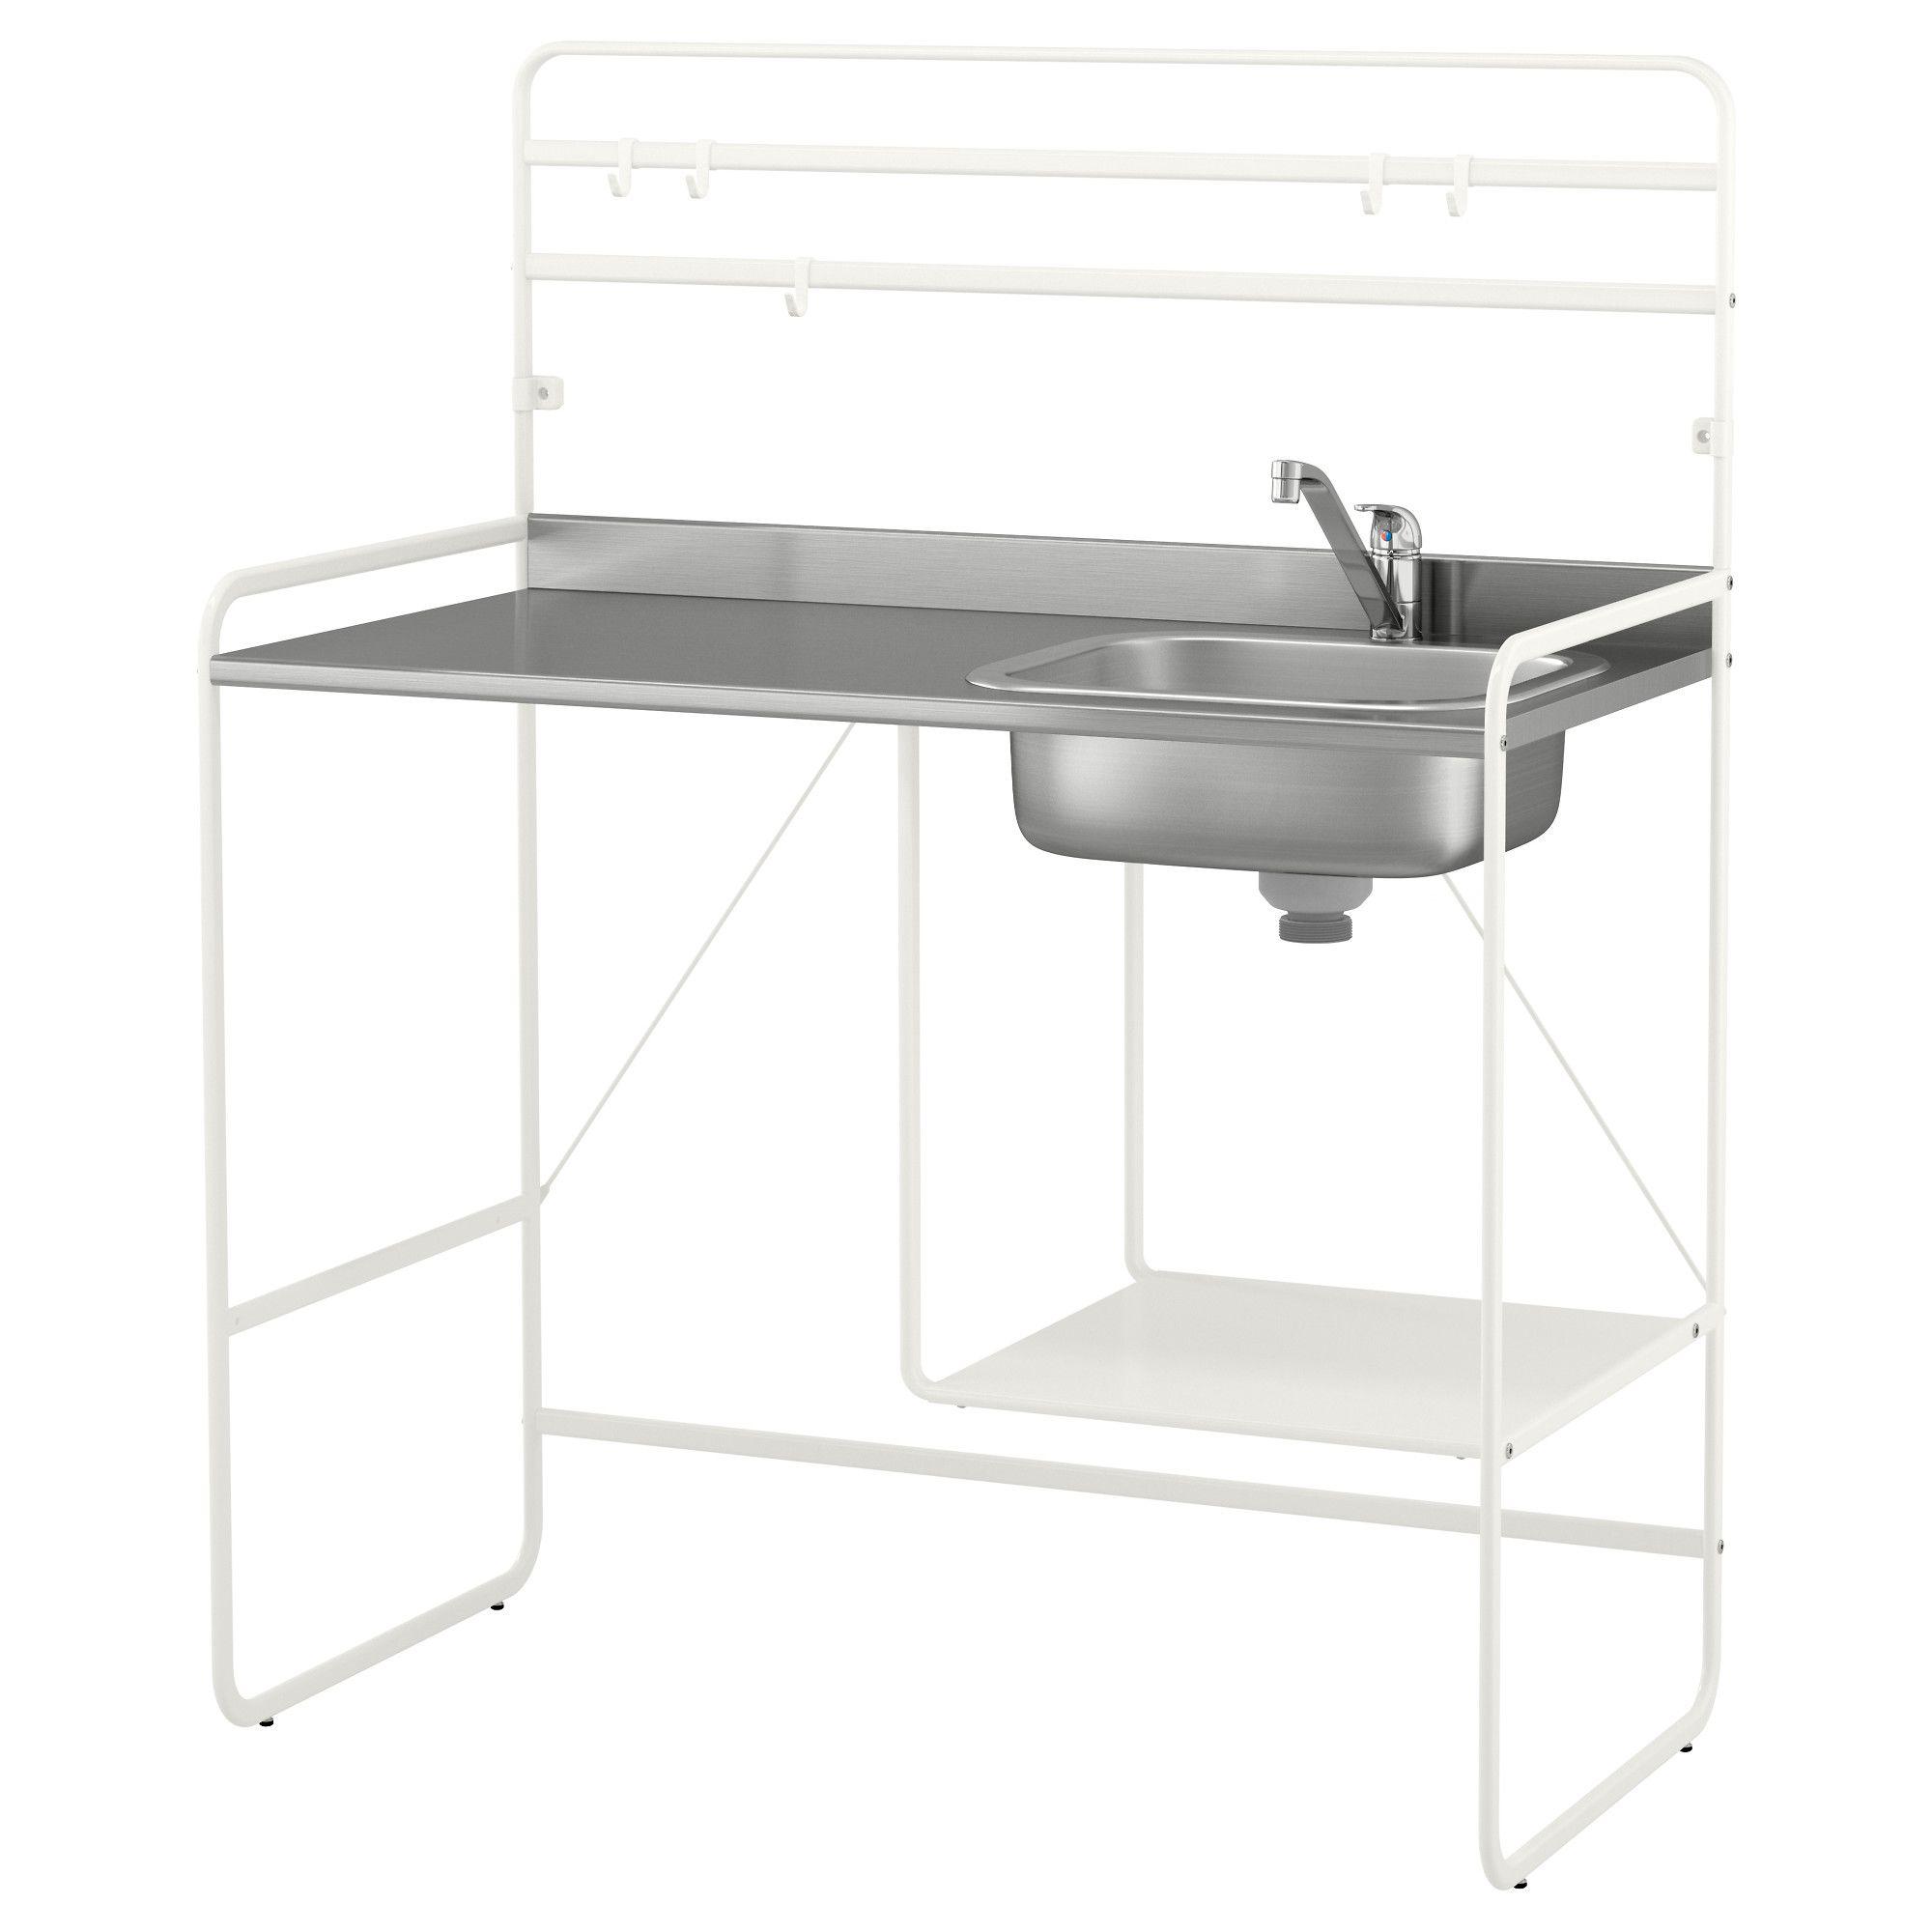 Minikitchen SUNNERSTA Design for Rentals Mini kitchen